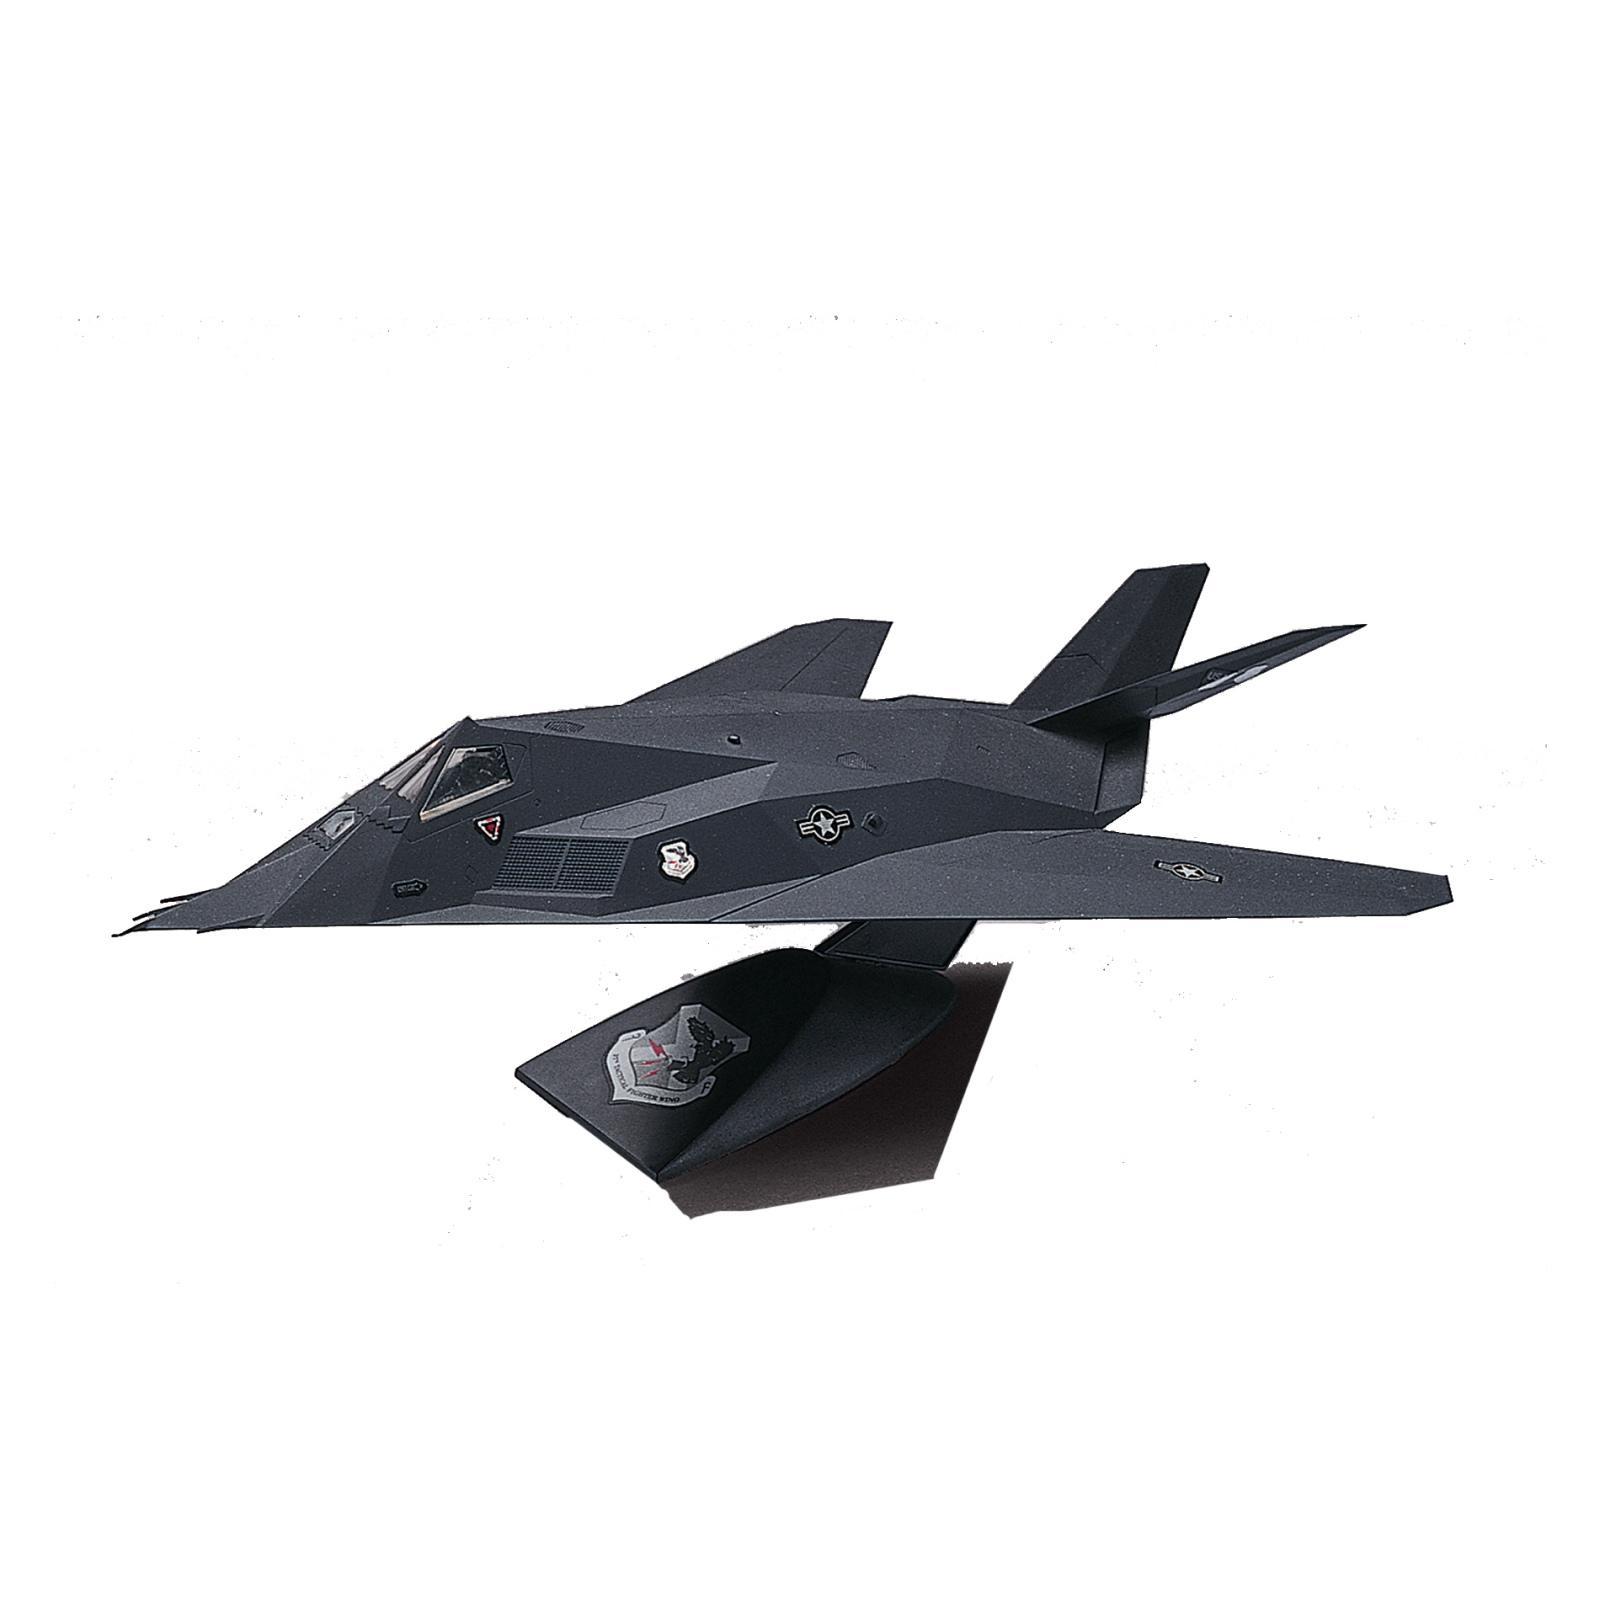 Revell 1:72 Scale F-117 Nighthawk Stealth Fighter Desktop Plastic Model Kit